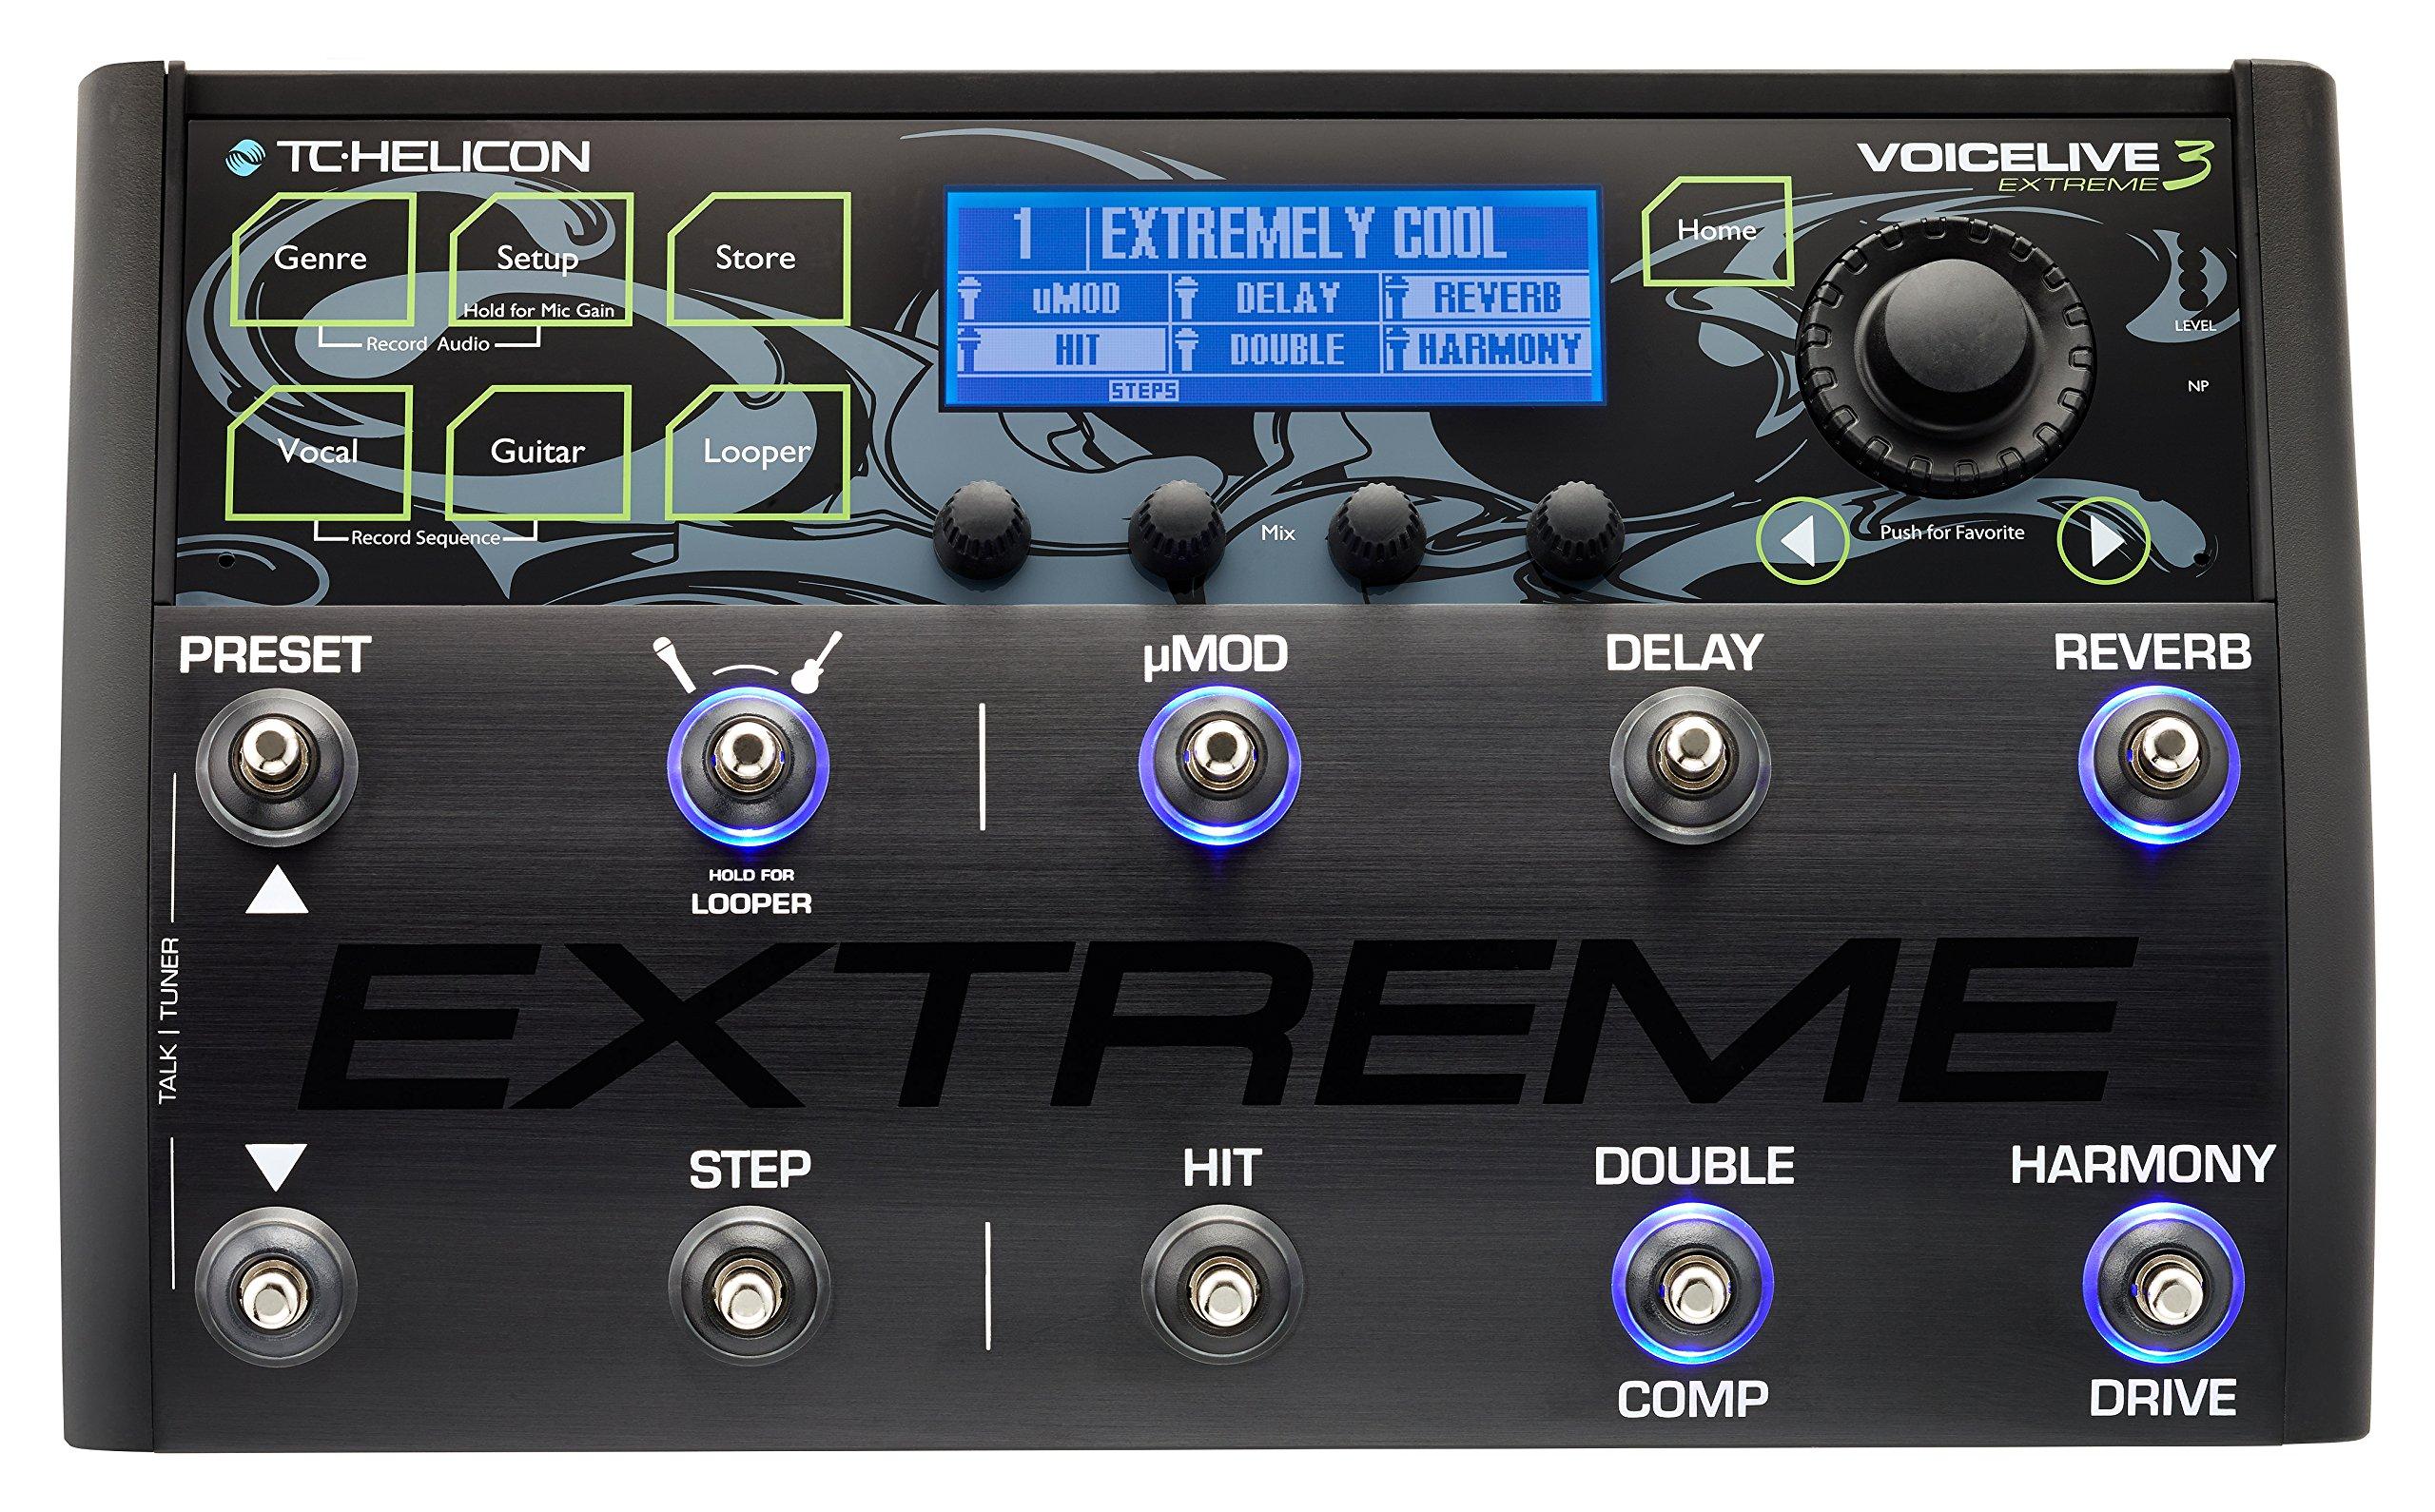 TC-Helicon VoiceLive 3 Extreme